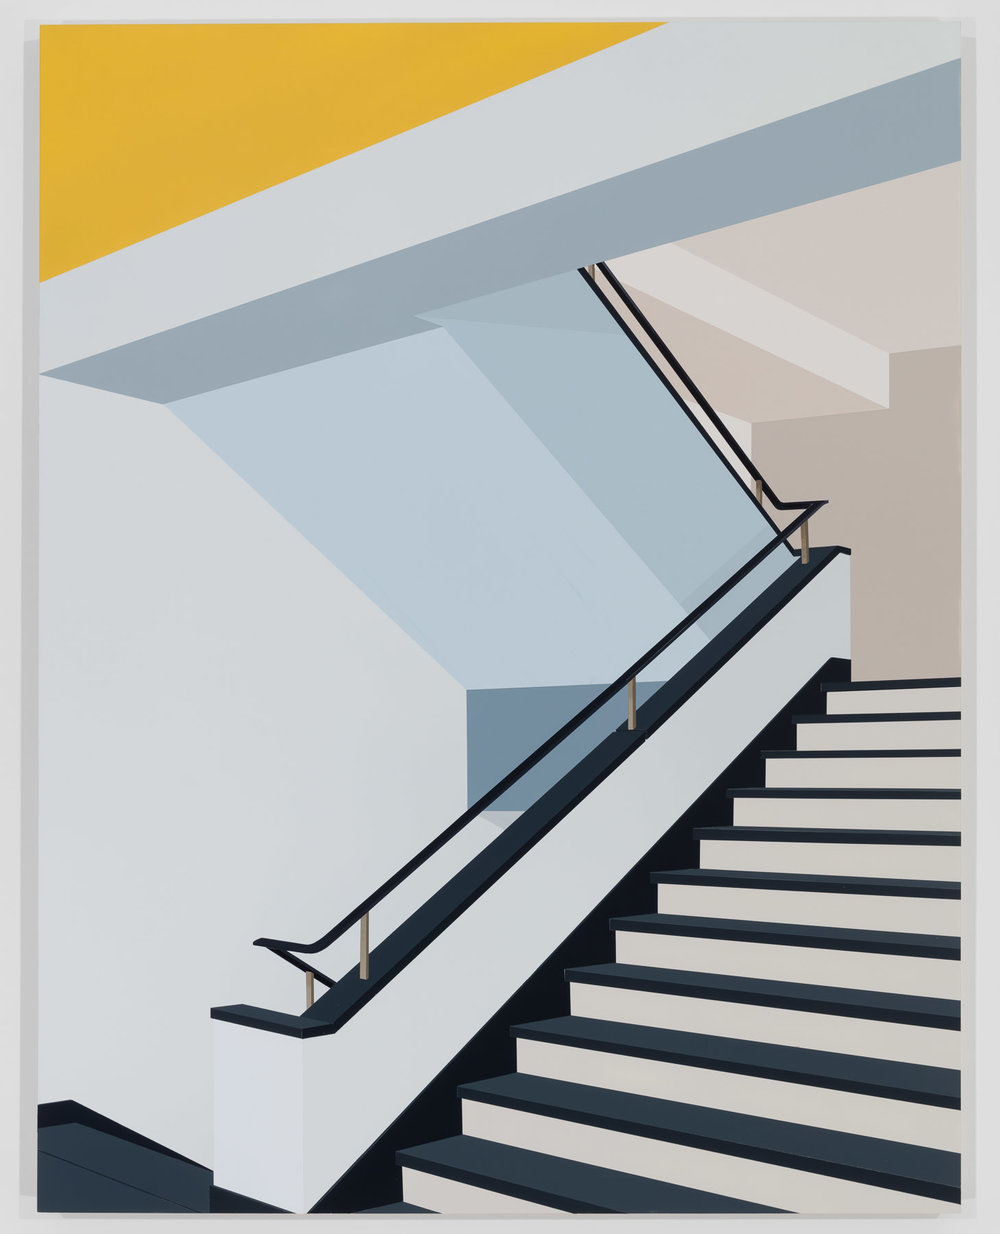 Bauhaus, Dessau, 2018. Acrylic on Dibond, 40 x 31 inches (101.6 x 78.7 cm)